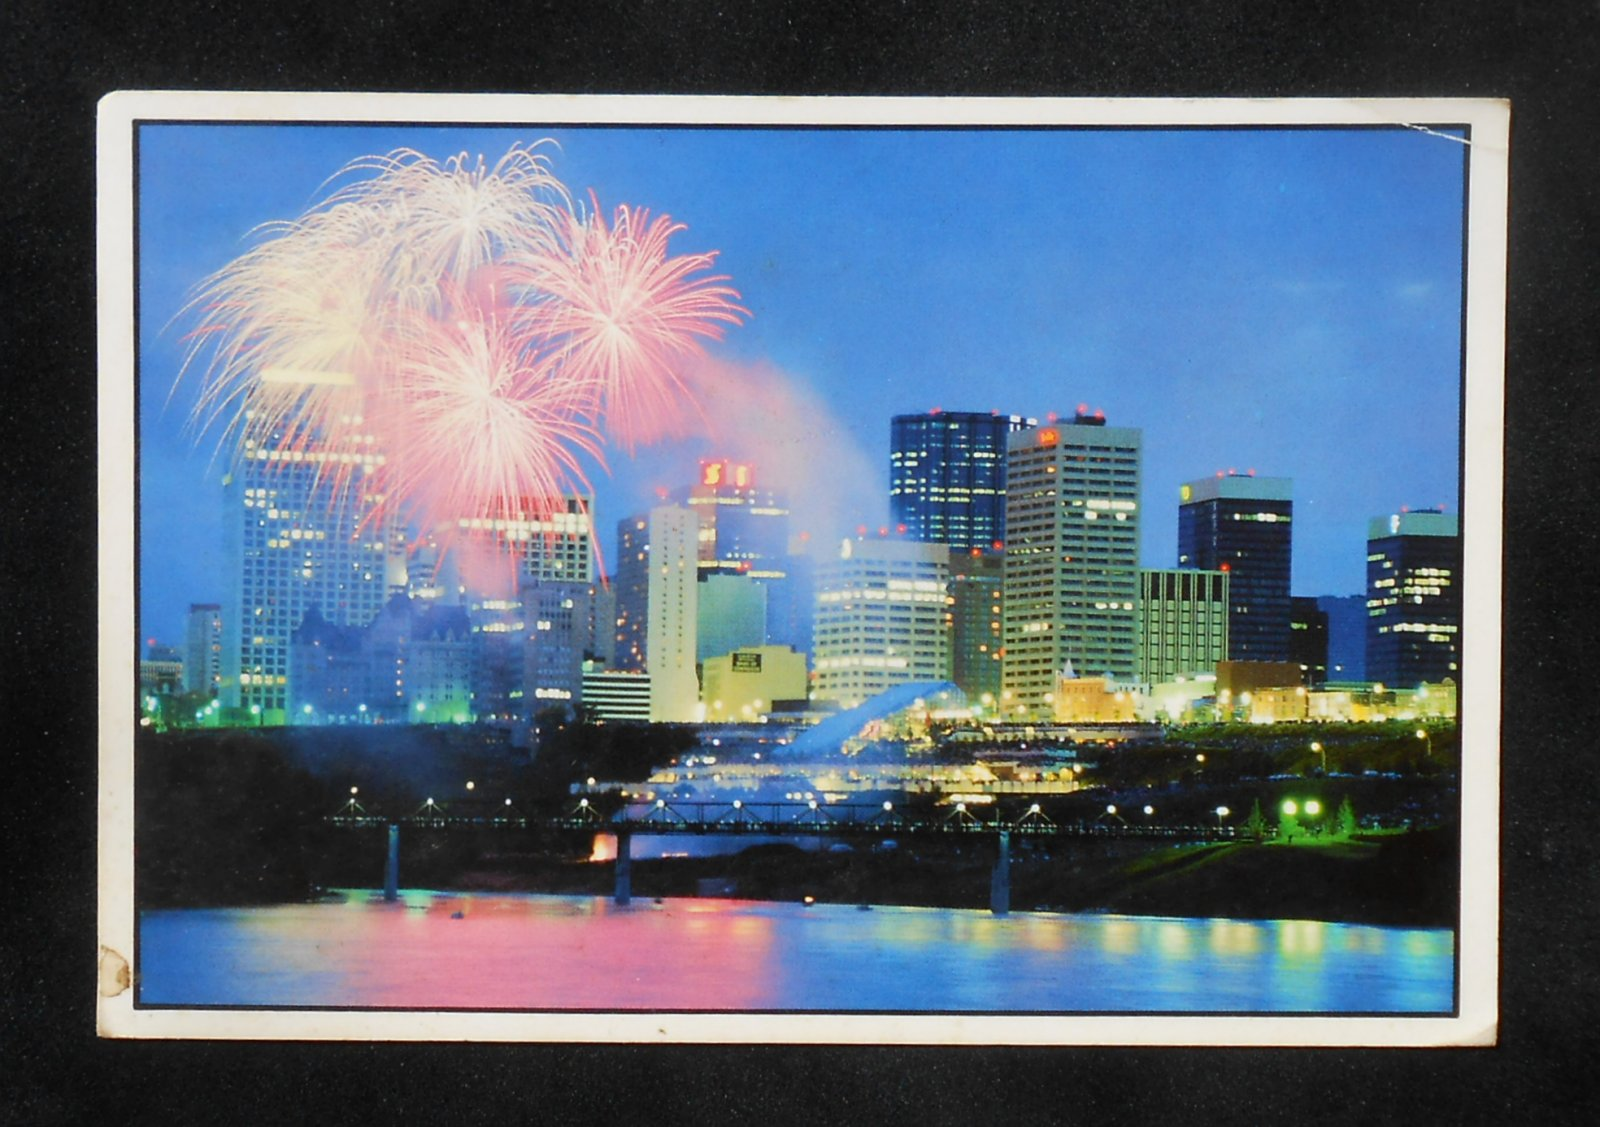 Edmonton (AB) Canada  city pictures gallery : ... Fireworks over the Skyline Postal History Edmonton AB Canada Postcard